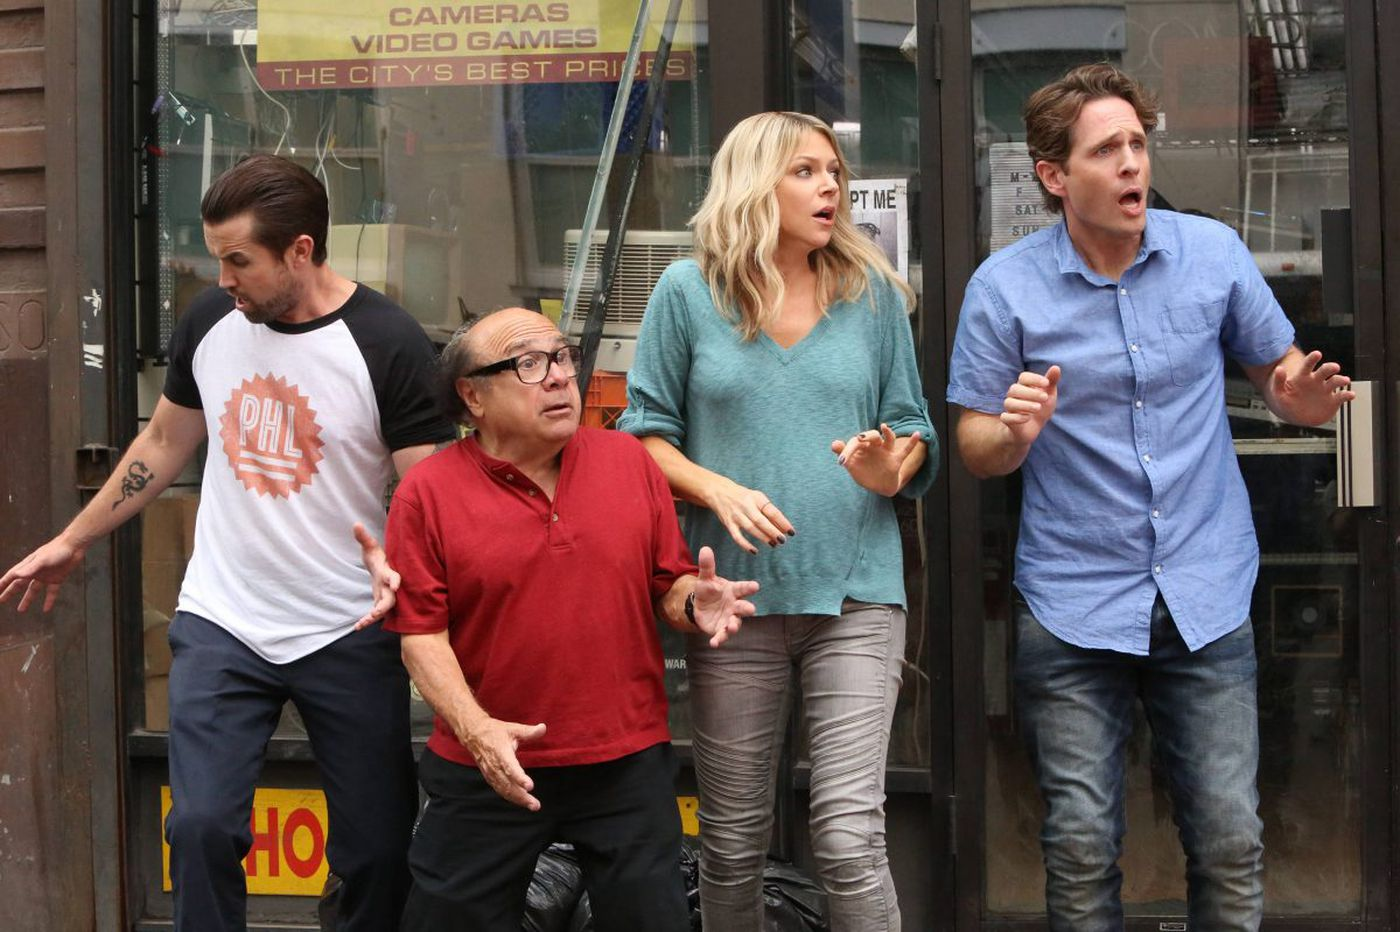 'It's Always Sunny in Philadelphia' pop-up bar opening - in Chicago